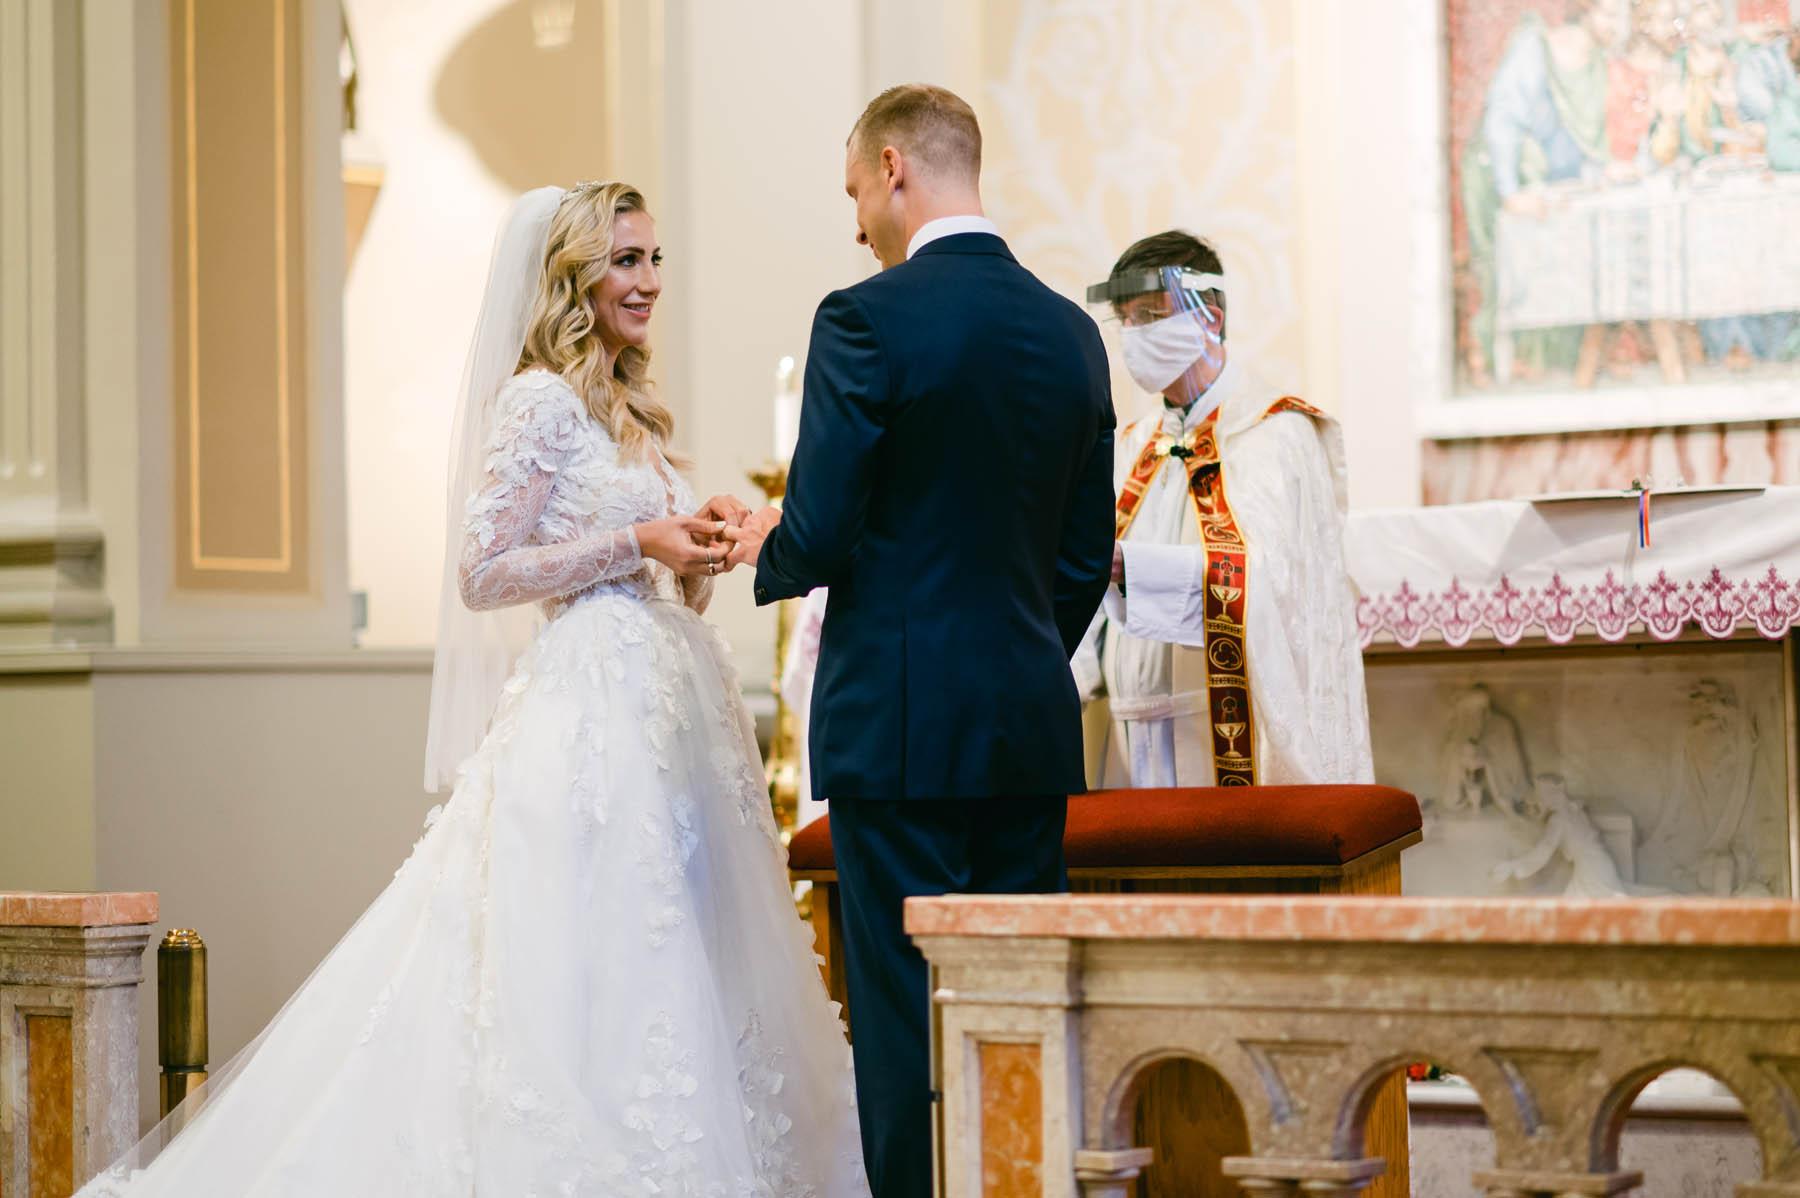 Assumption church bride and groom